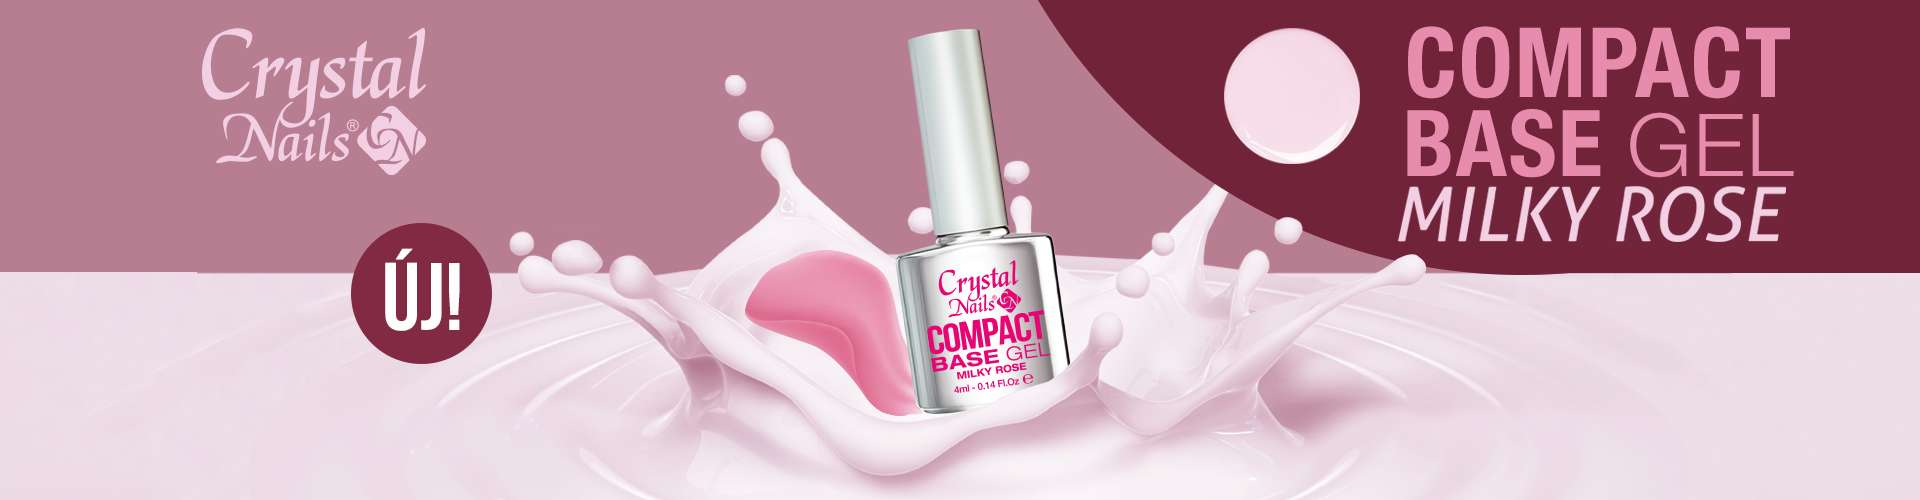 143_milky_rose_compact_base_gel